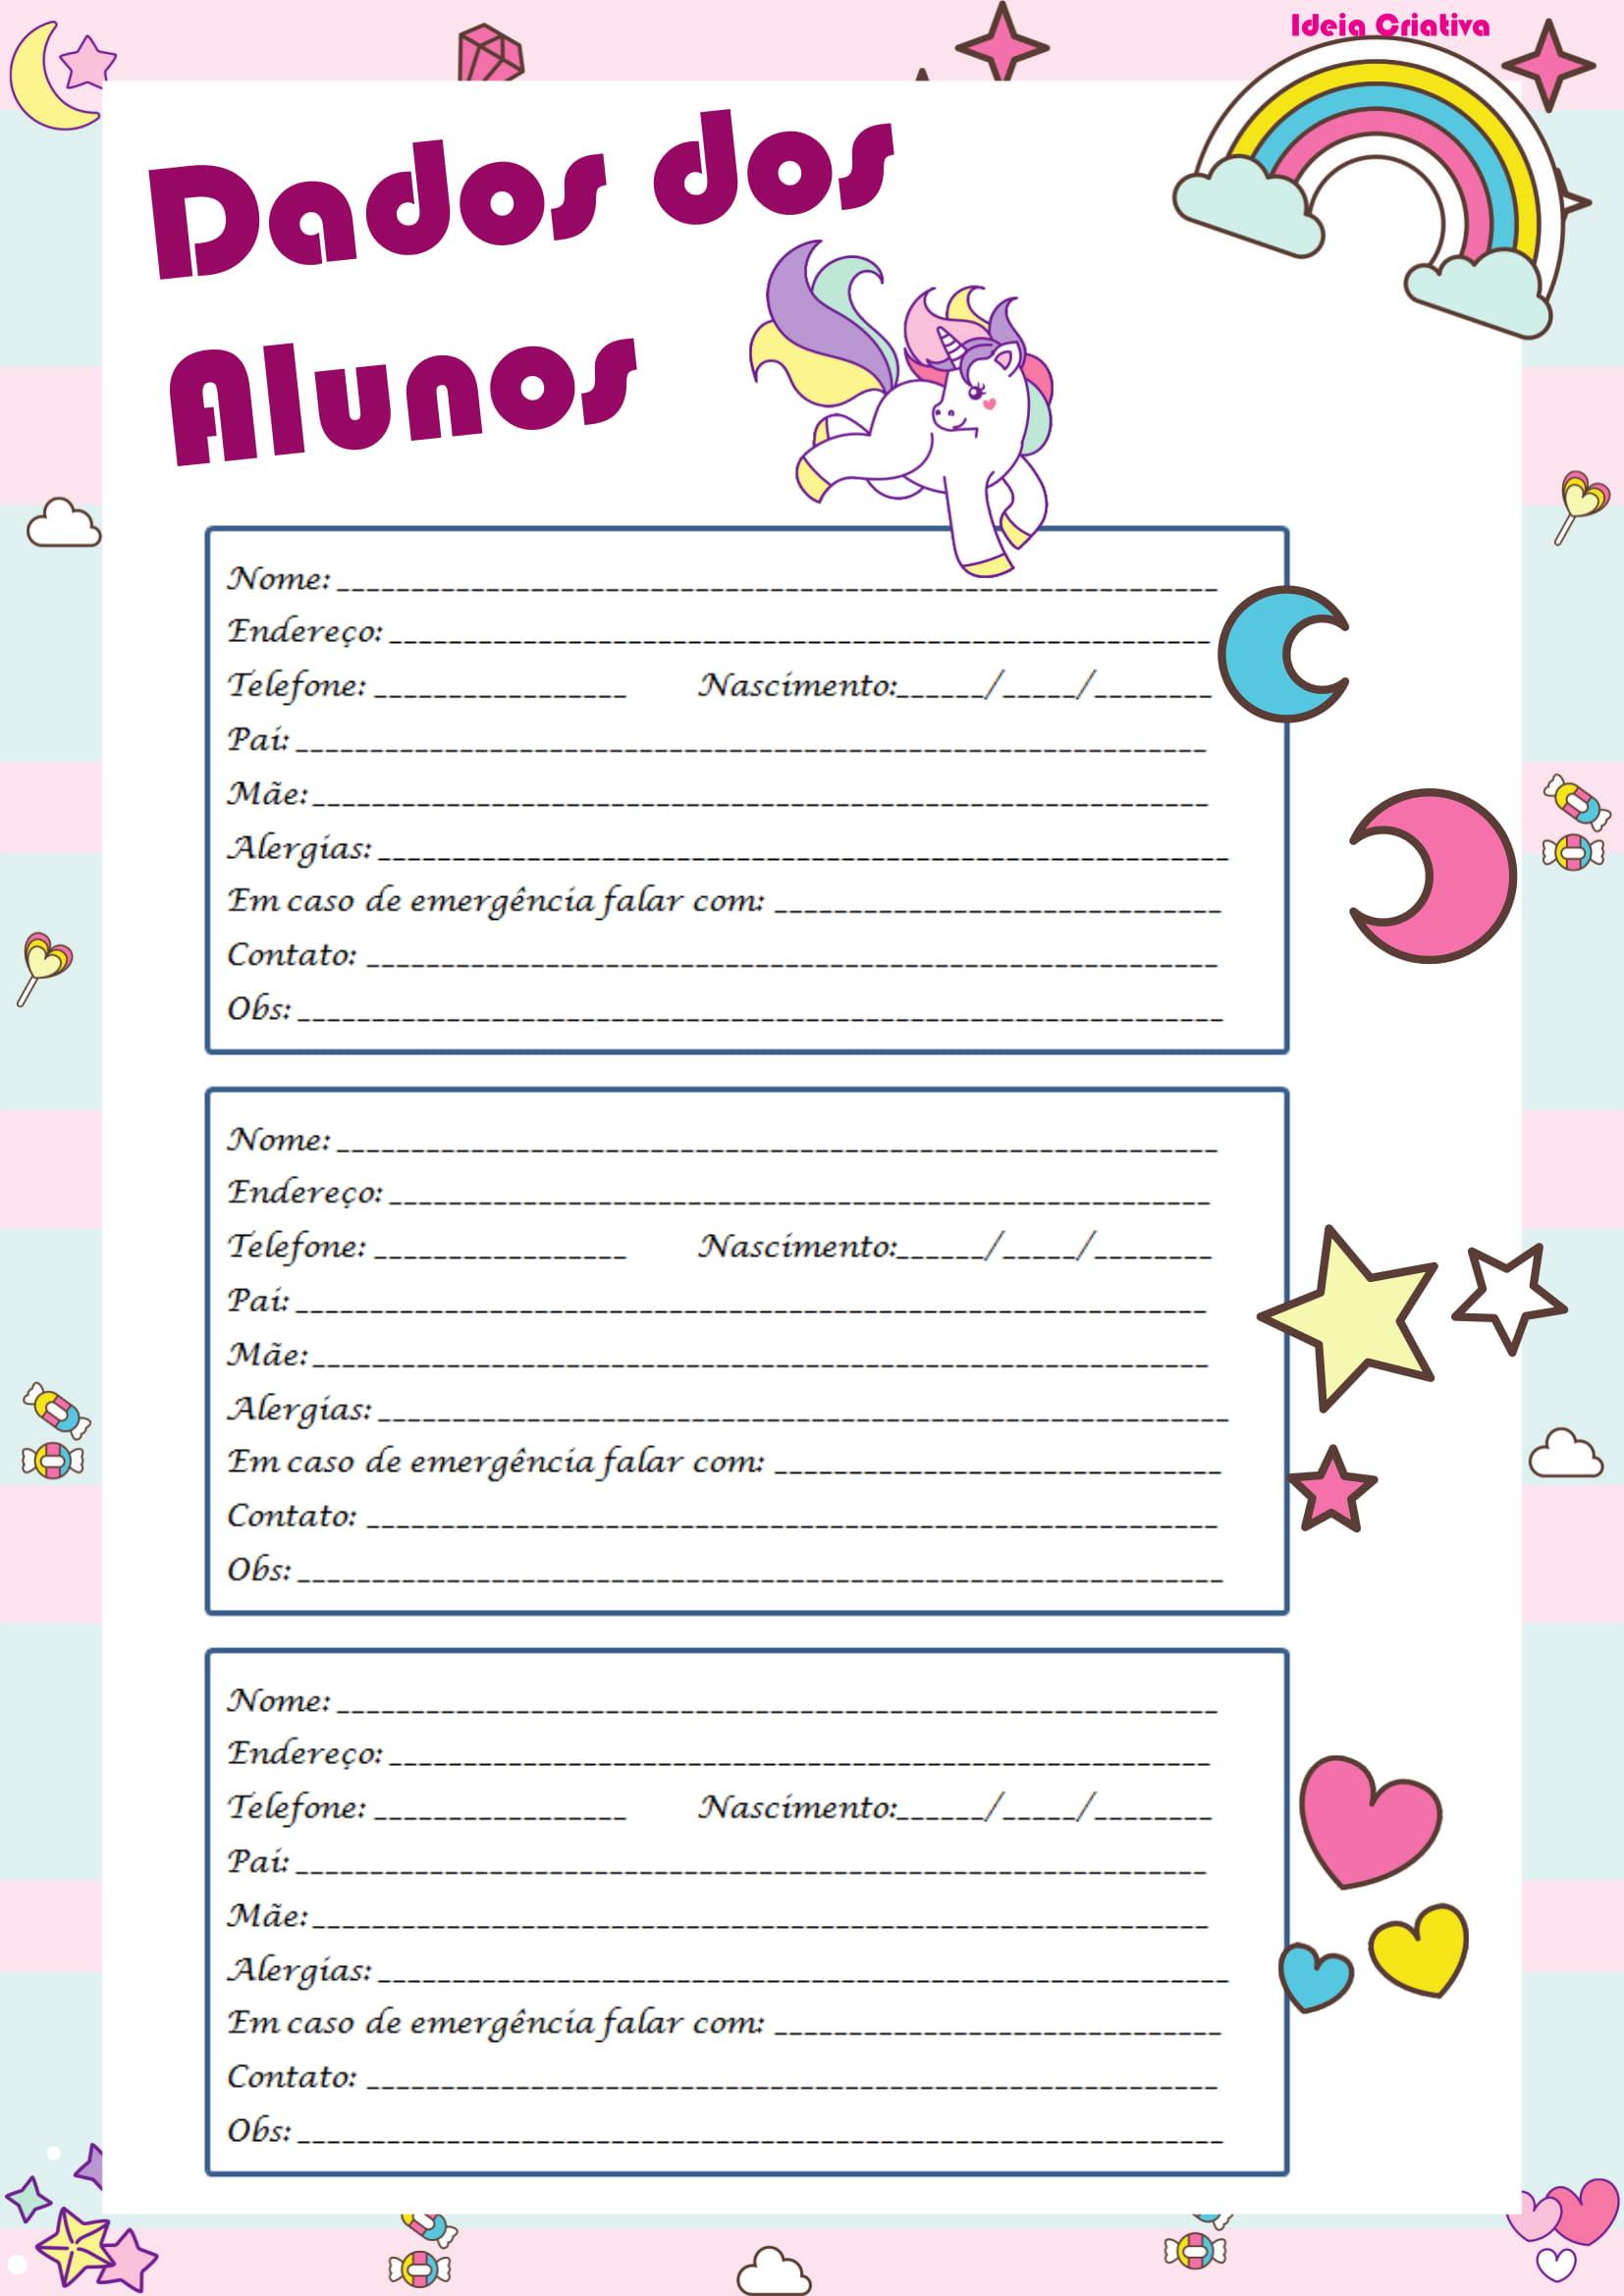 planner-2019-personalizado-para-baixar-e-imprimir-grati-download-free-professor (7)